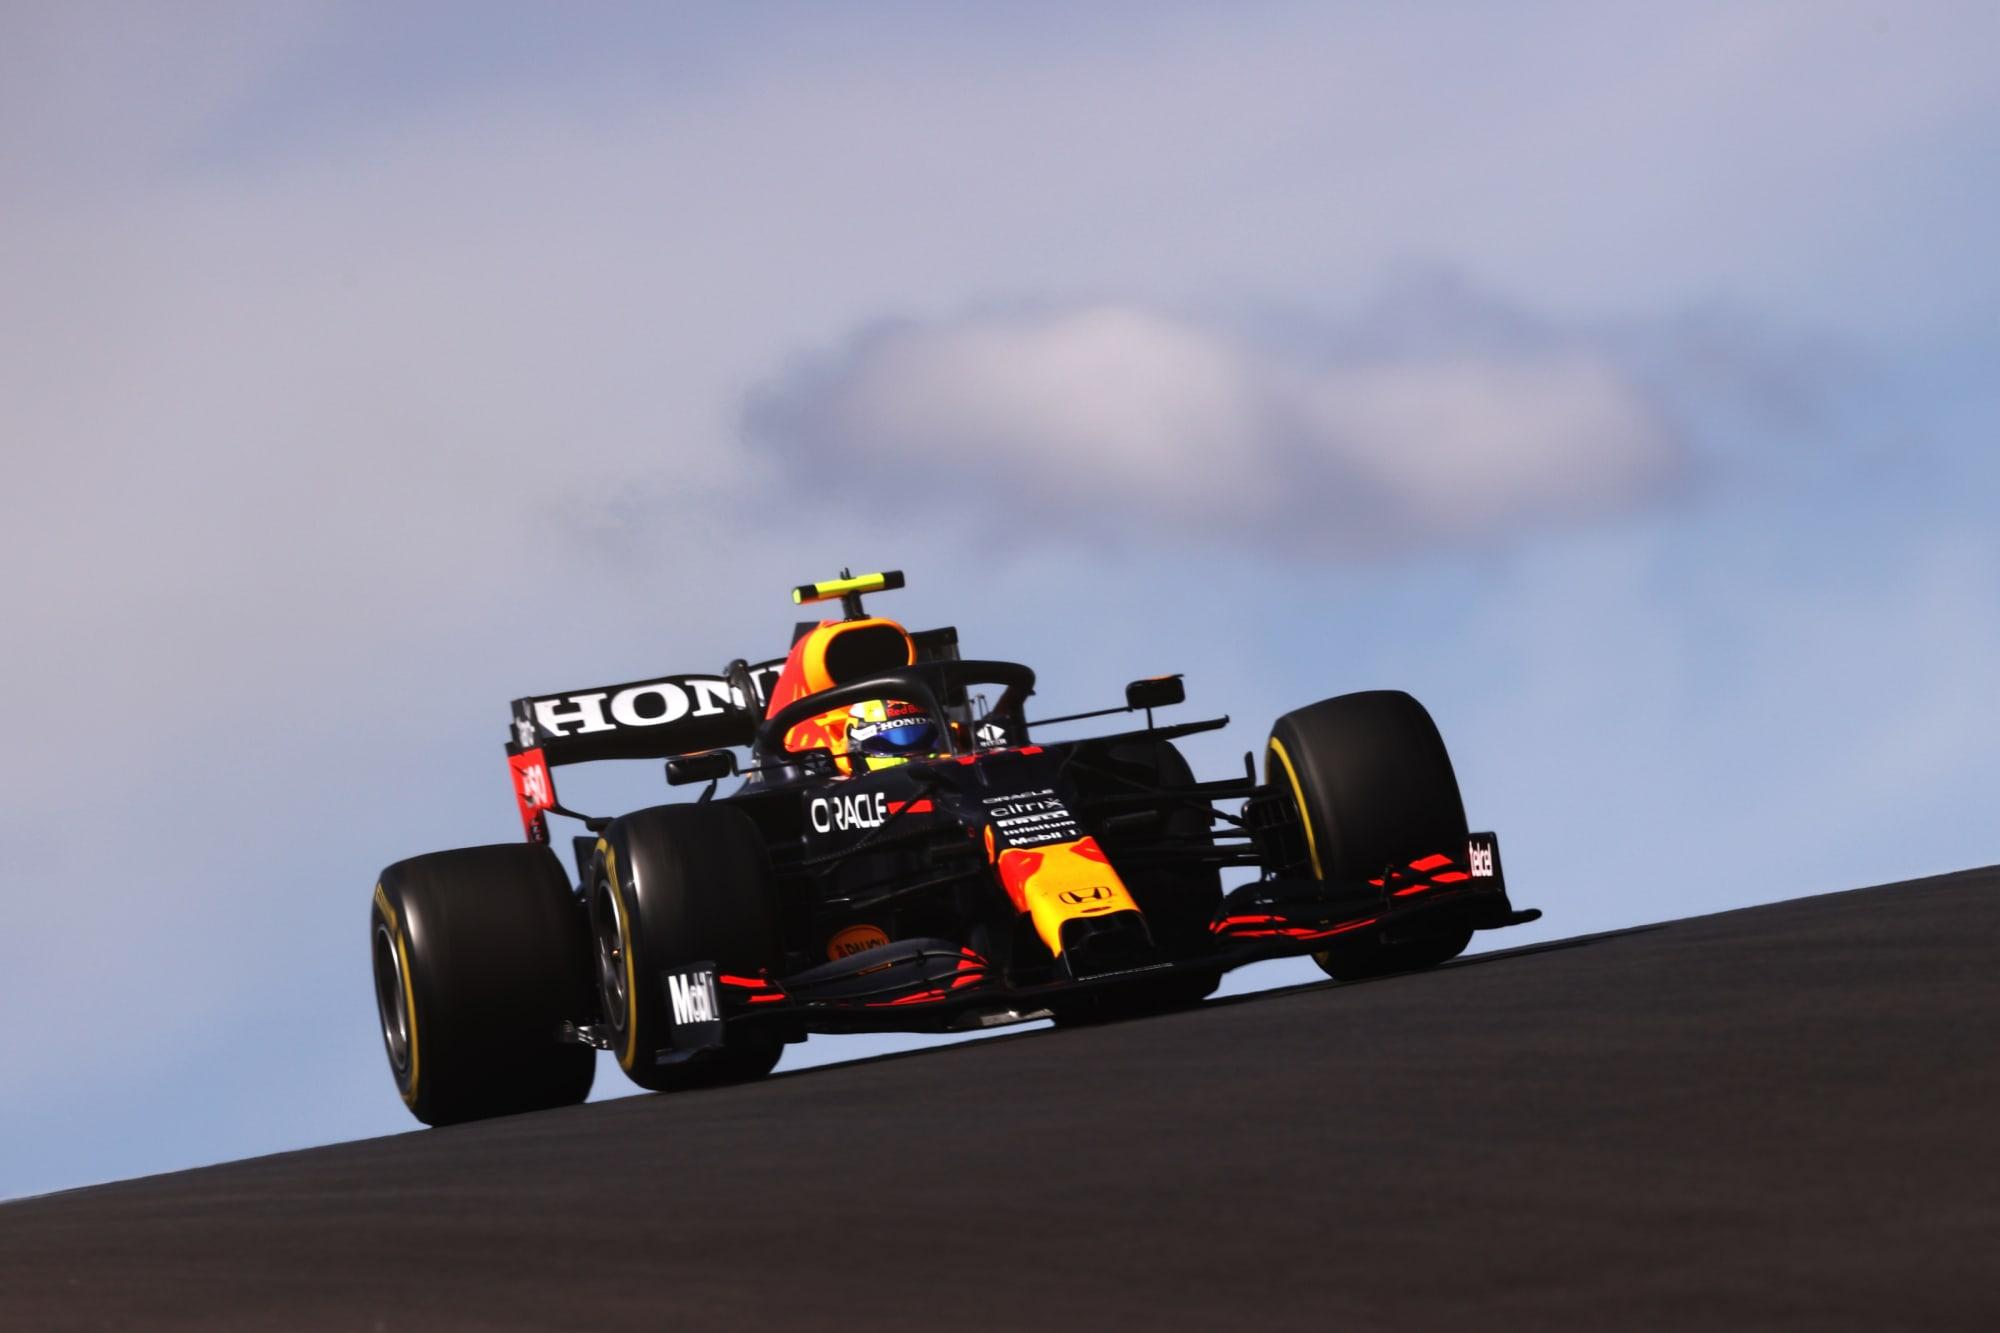 Formula 1: Completely believable rumor emerges after Portimao